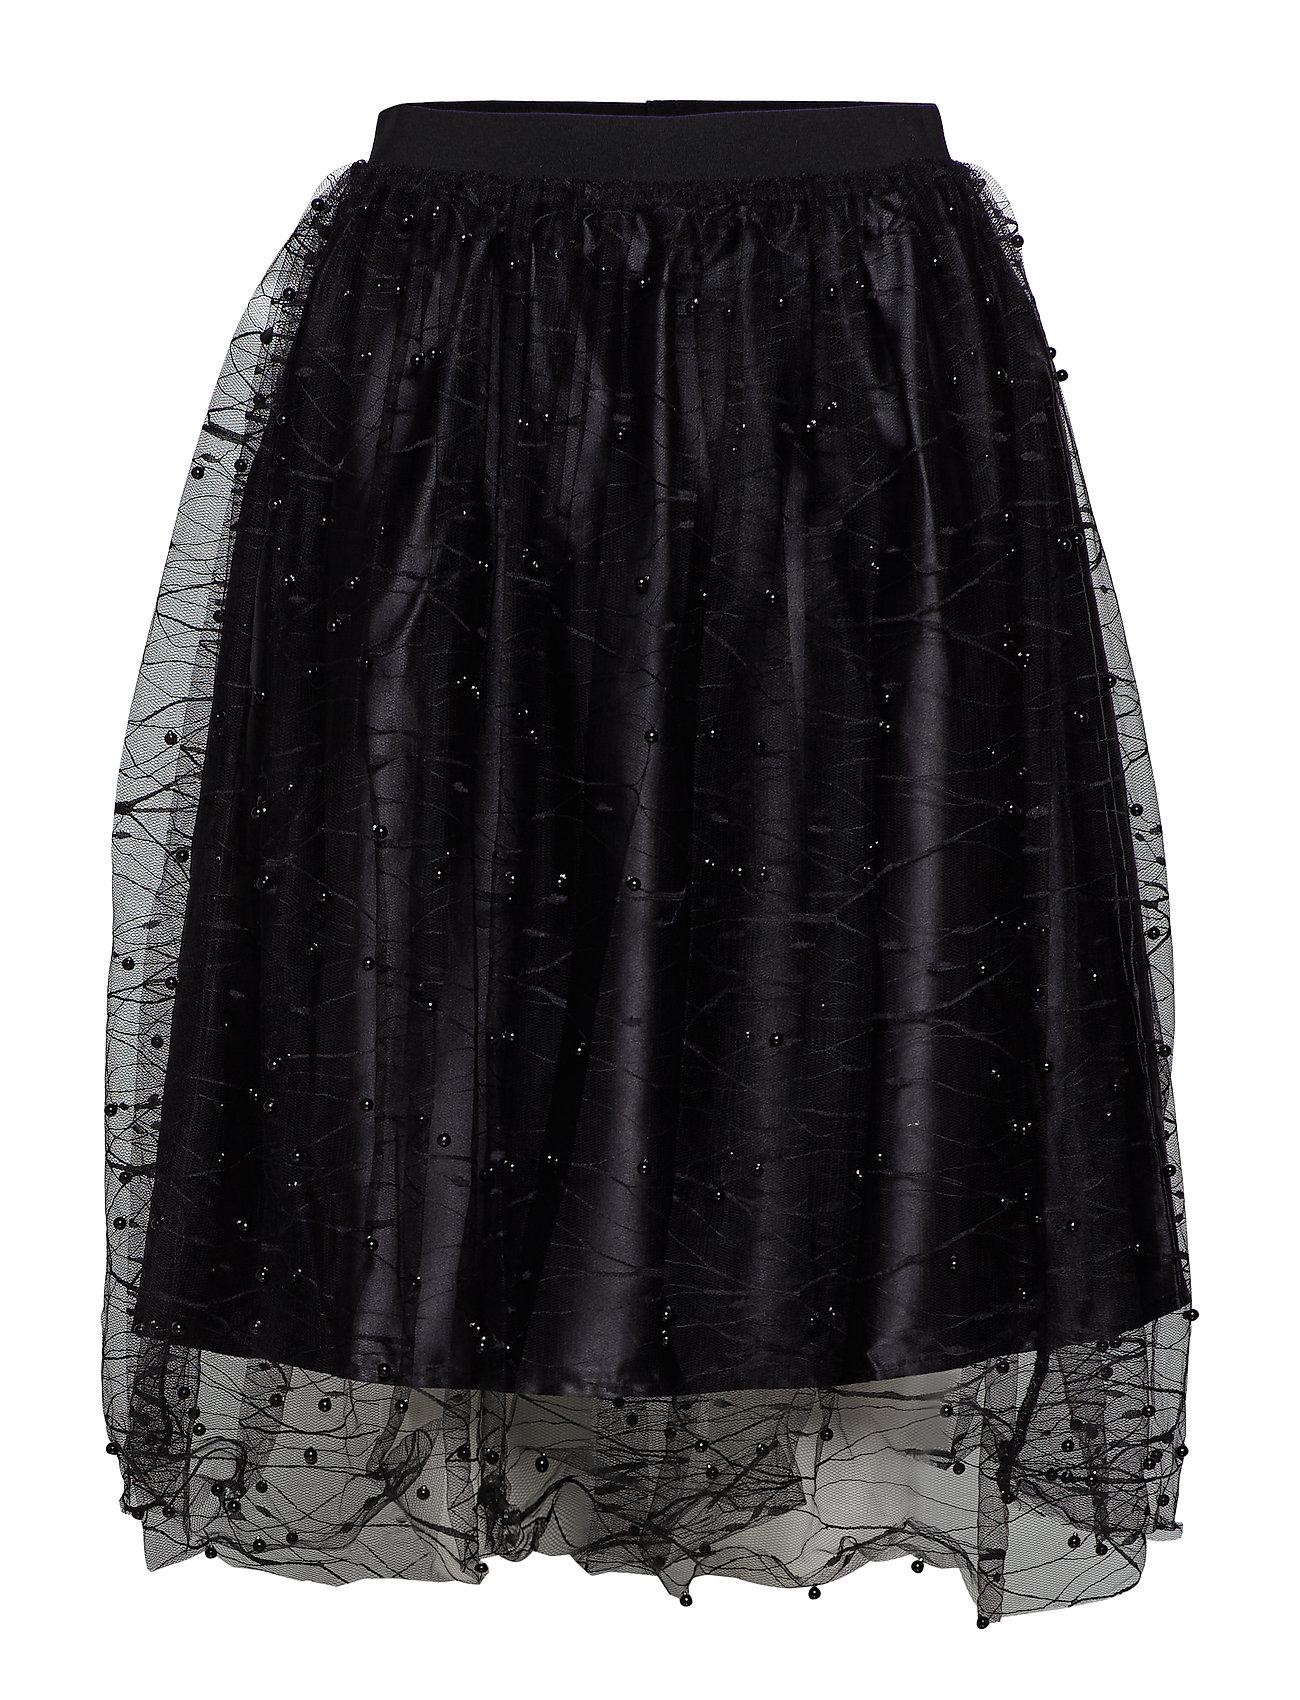 Bruuns Bazaar Chaza Toxo skirt